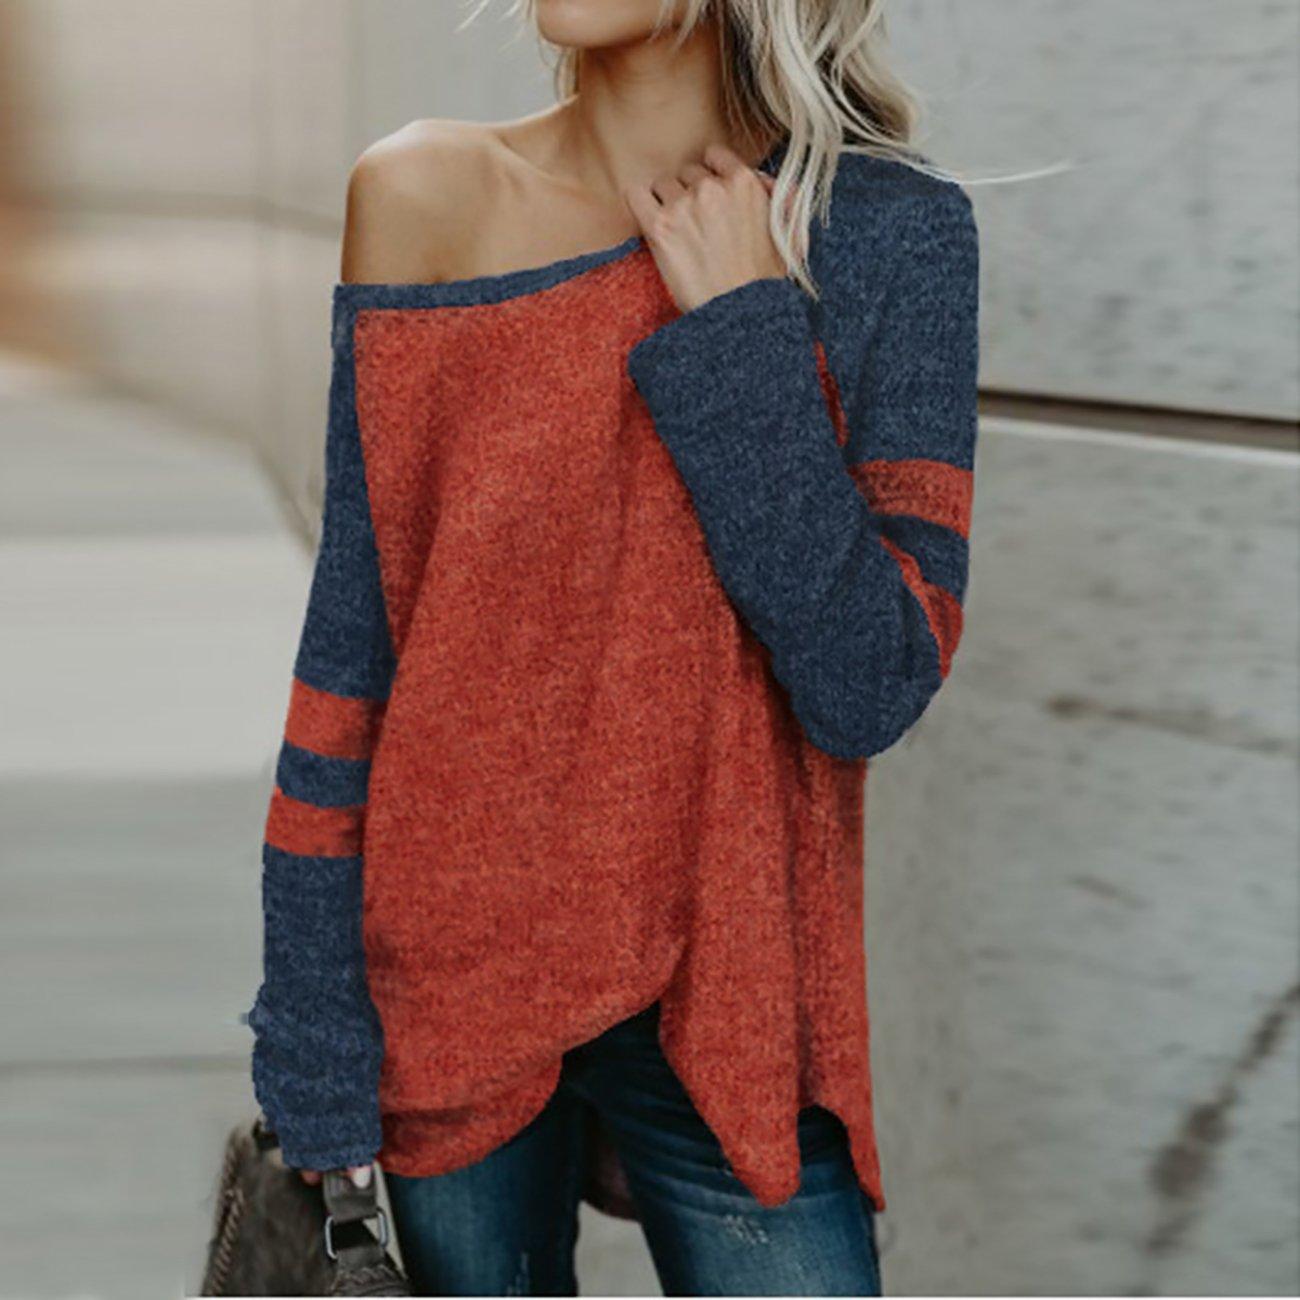 43501387ba Yieune Langarmshirt Damen aus der Schulter Bluse Schöne Oberteile Casual  Tunika Pullover: Amazon.de: Bekleidung